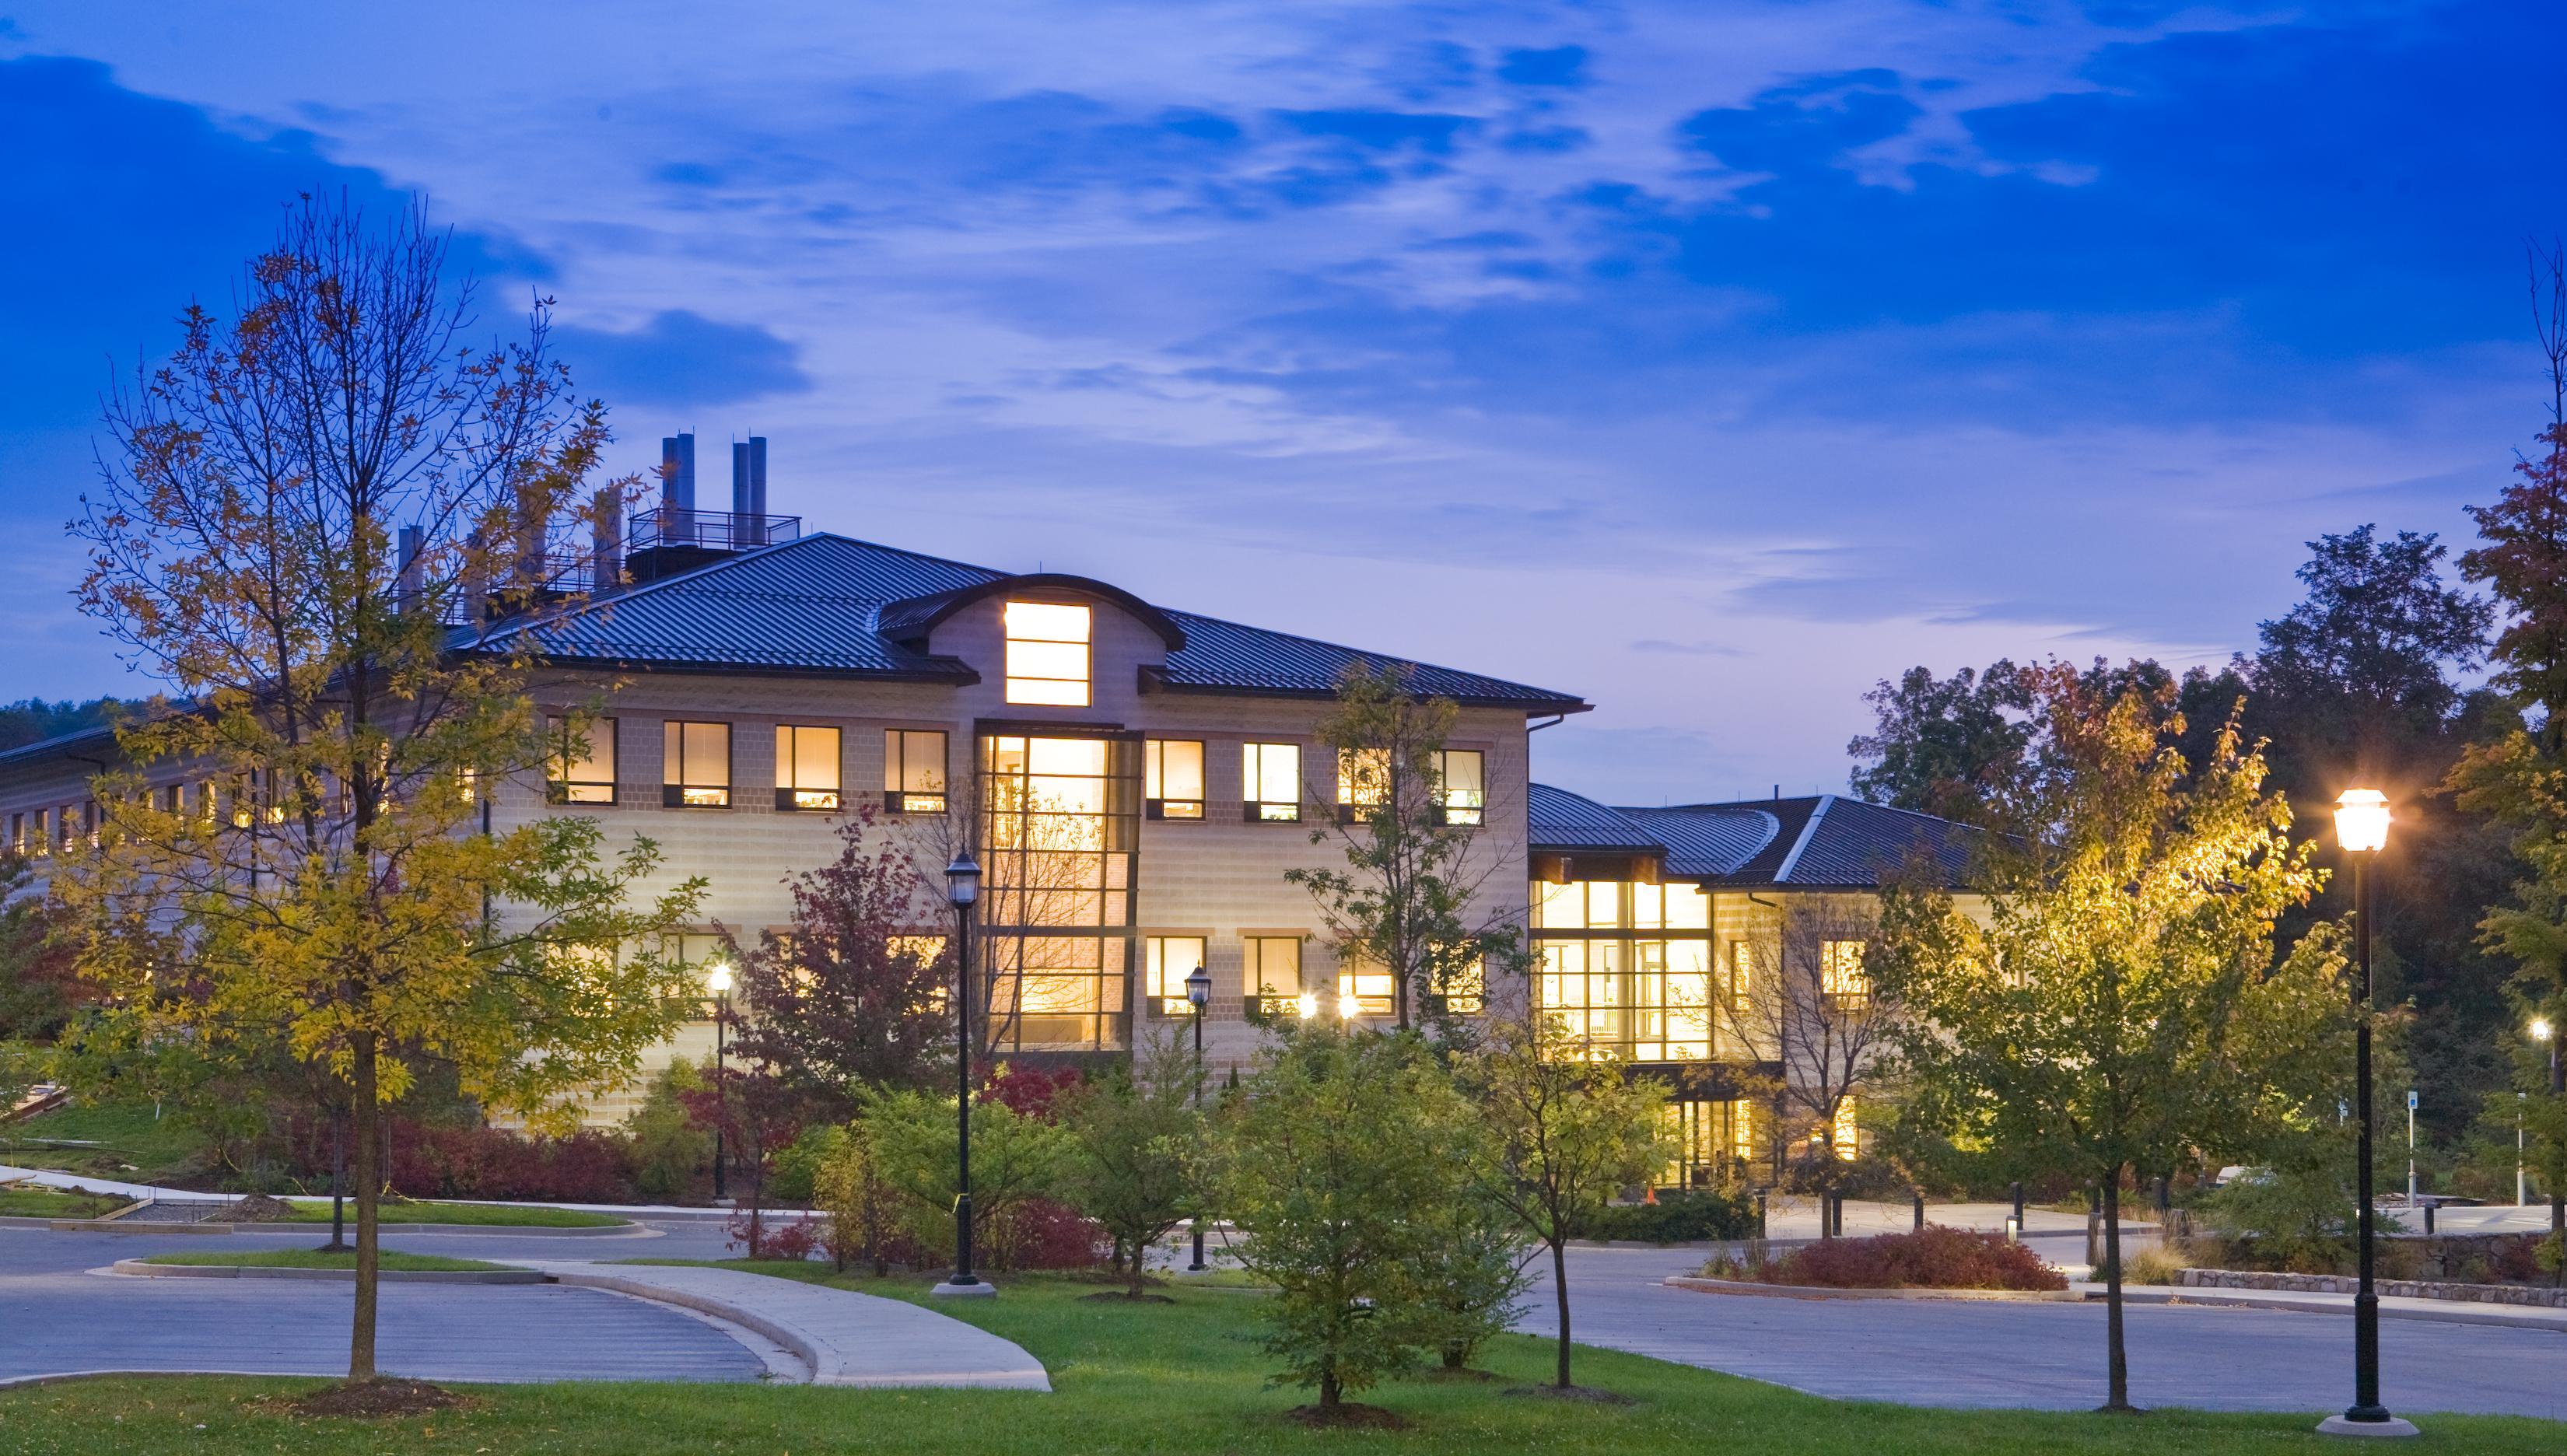 Appalachian Laboratory building at night